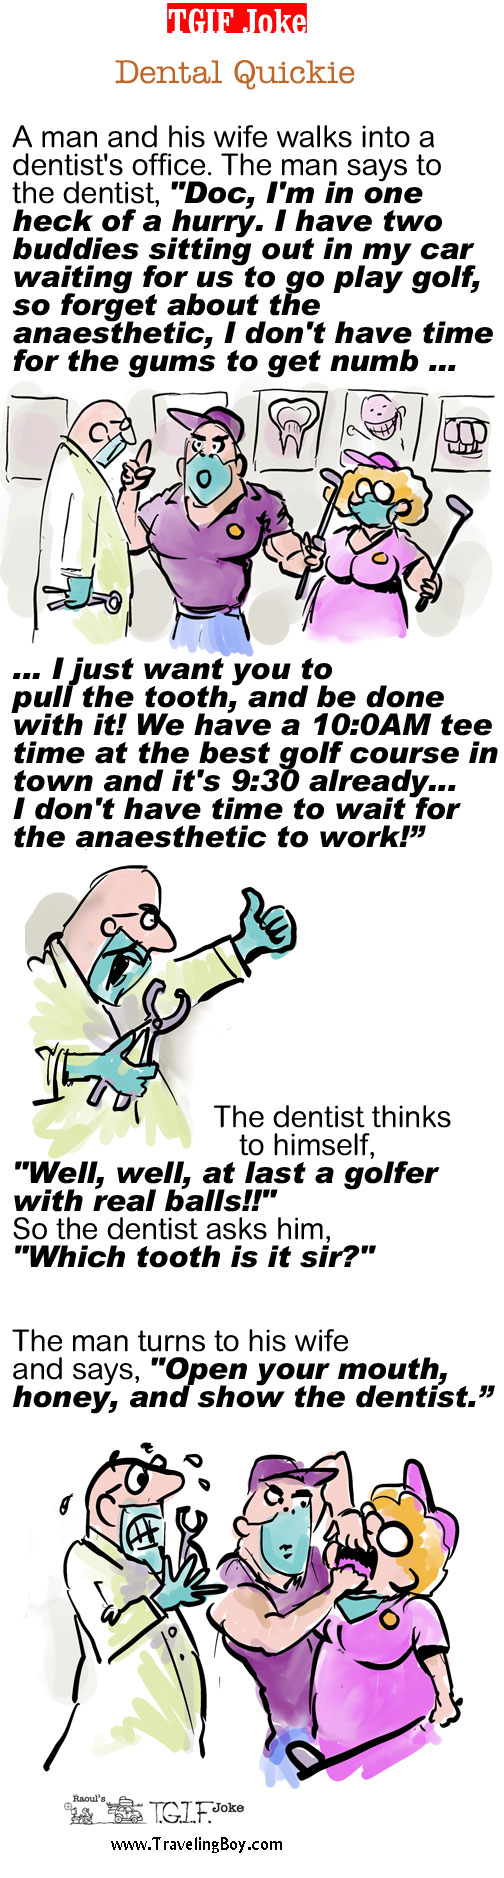 TGIF Joke of the Week: Dental Quickie